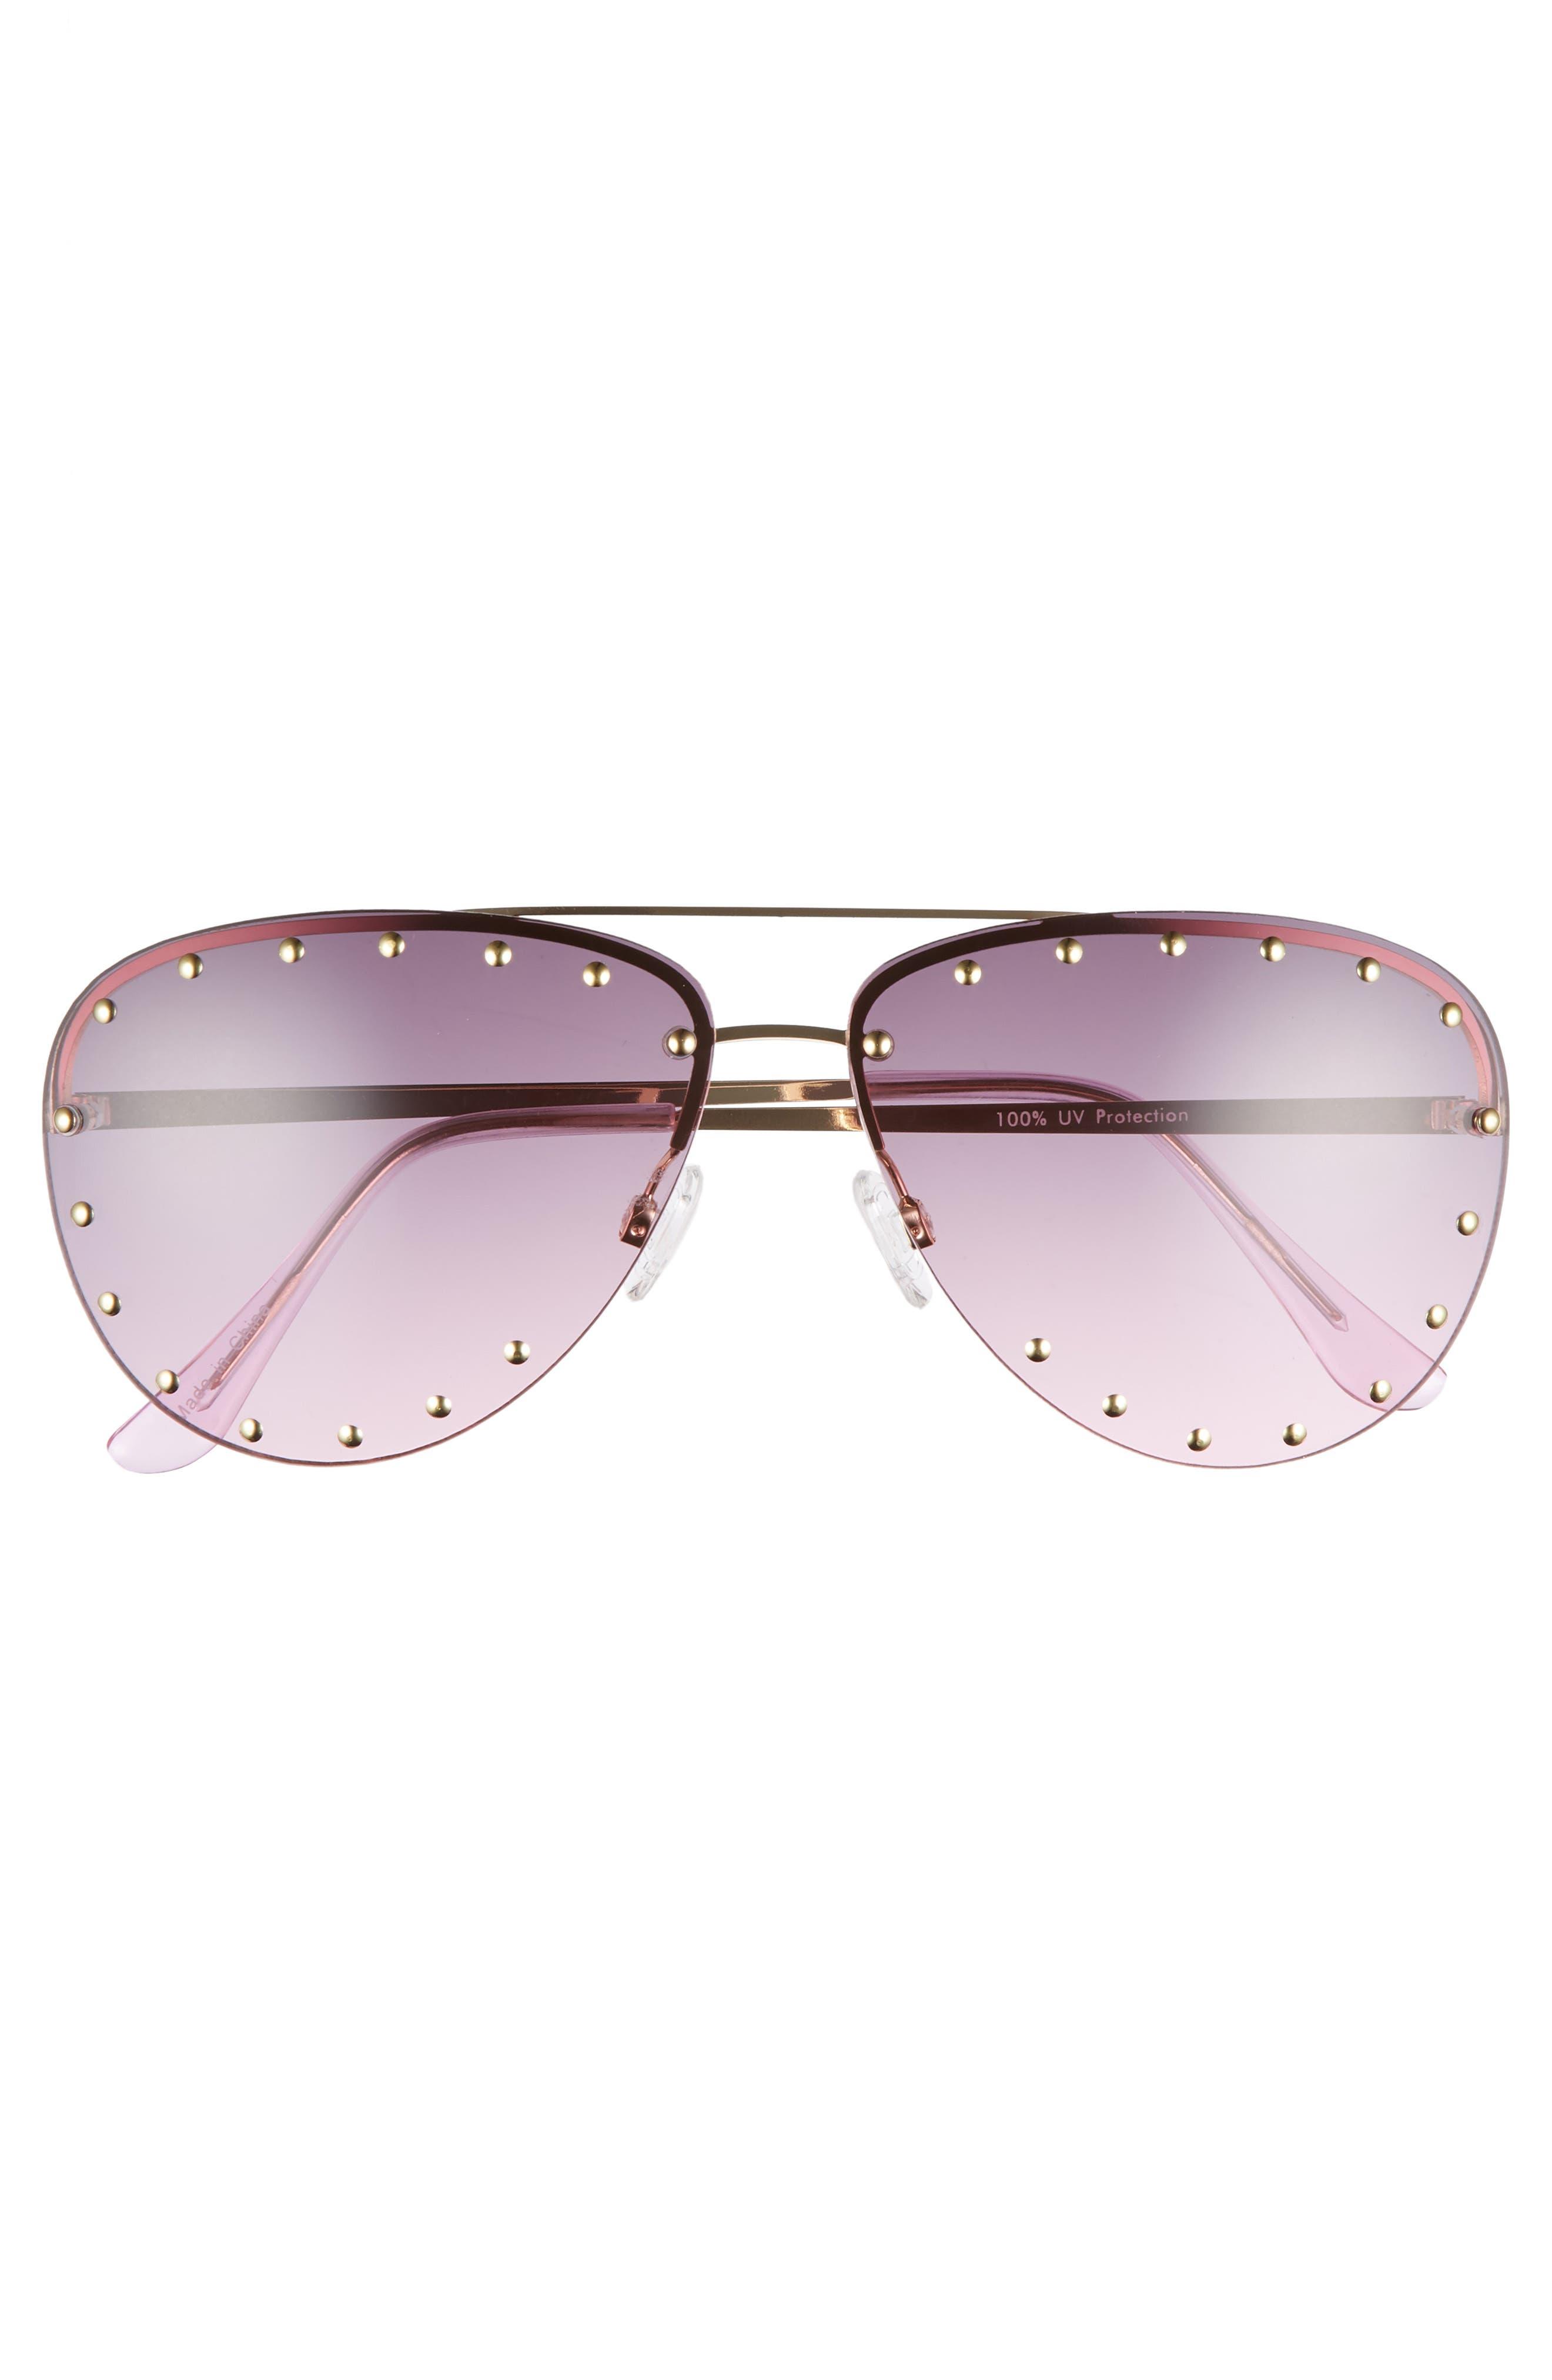 63mm Studded Aviator Sunglasses,                             Alternate thumbnail 6, color,